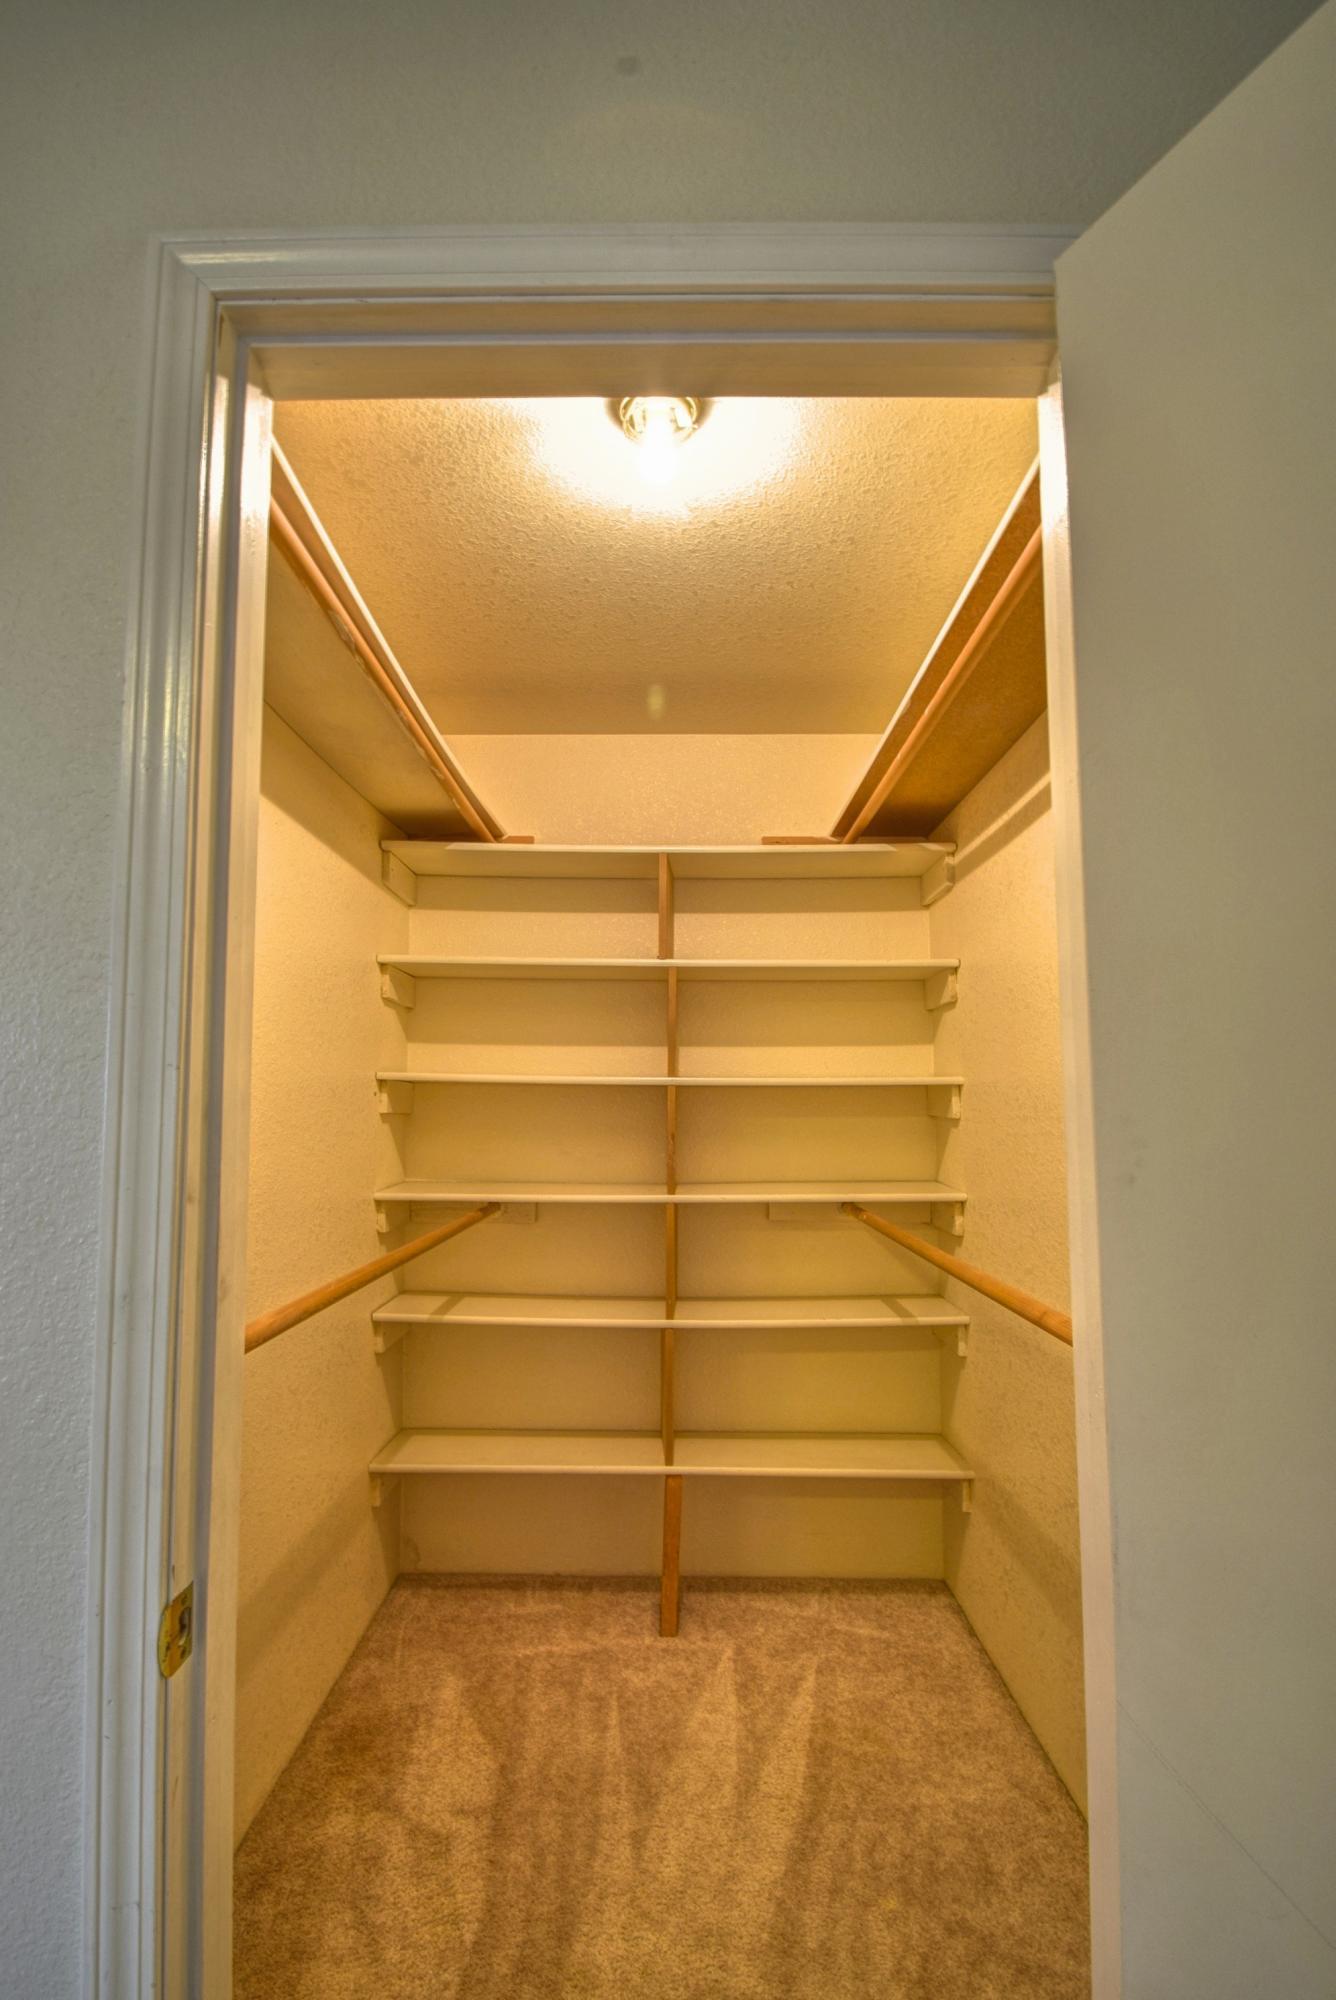 4th bedrm closet